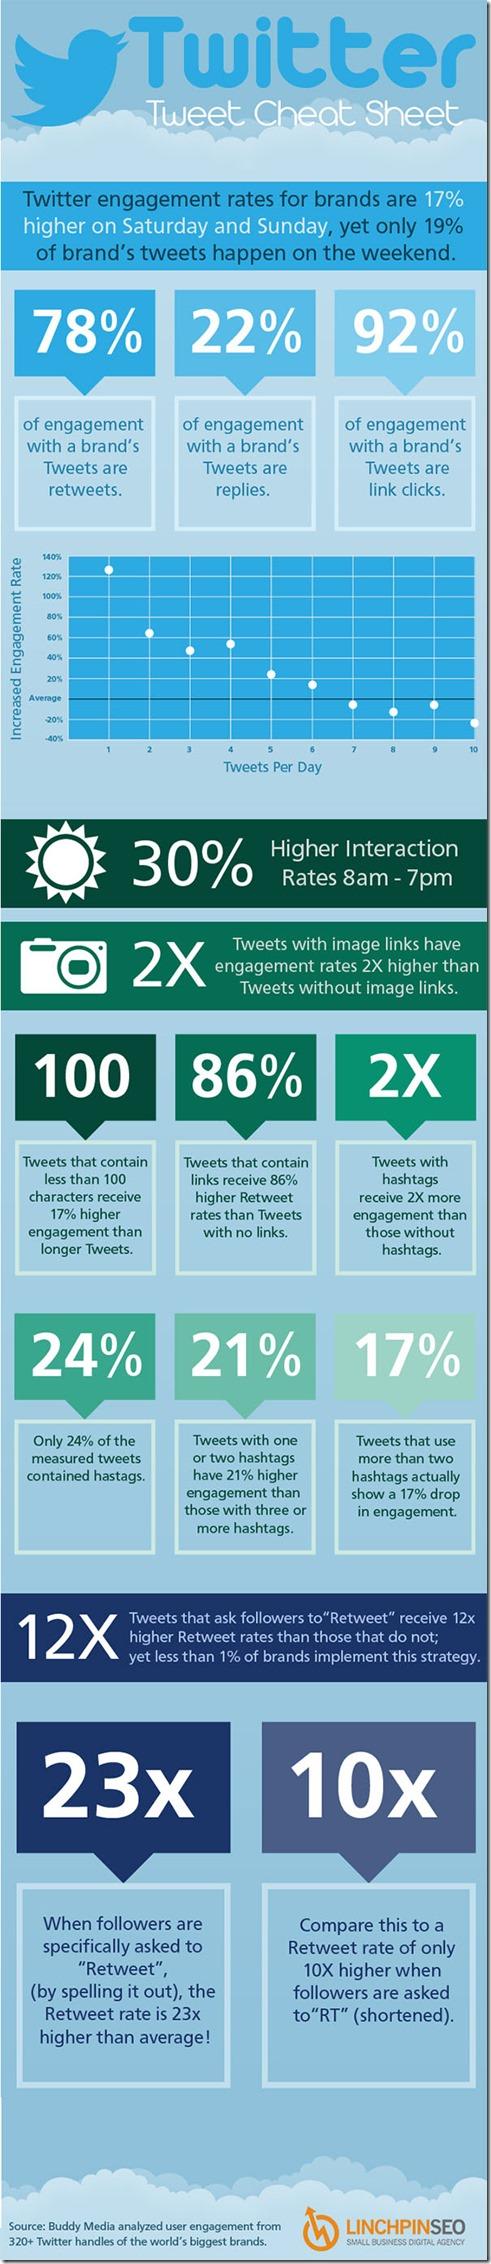 Infographic-Twitter-Tweet-Cheat-Sheet